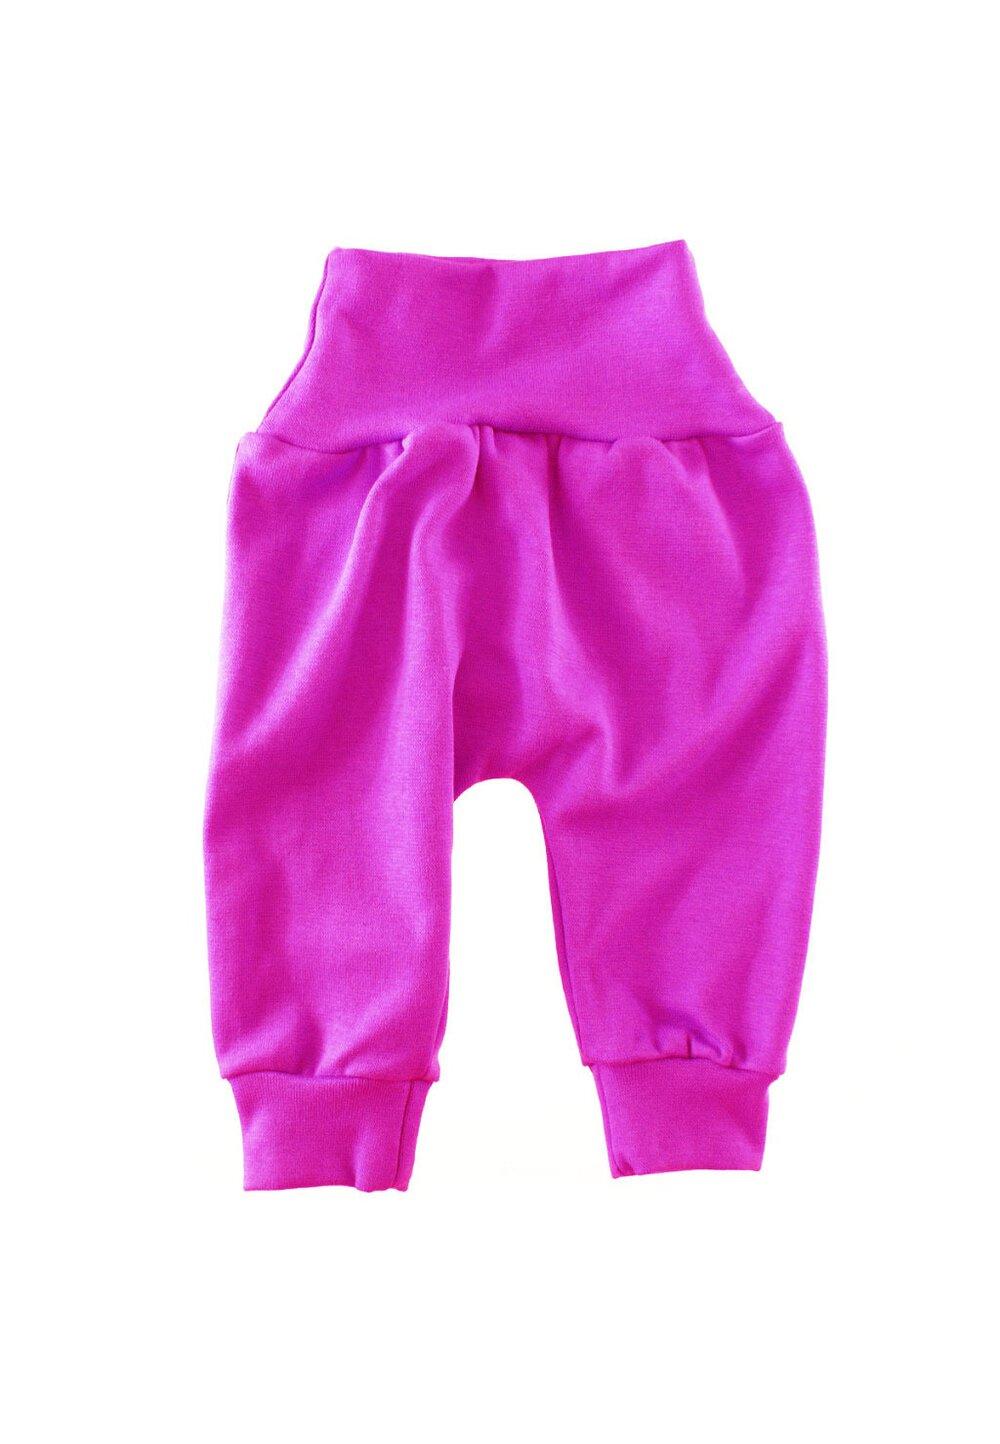 Pantaloni bebe, roz inchis P116 imagine